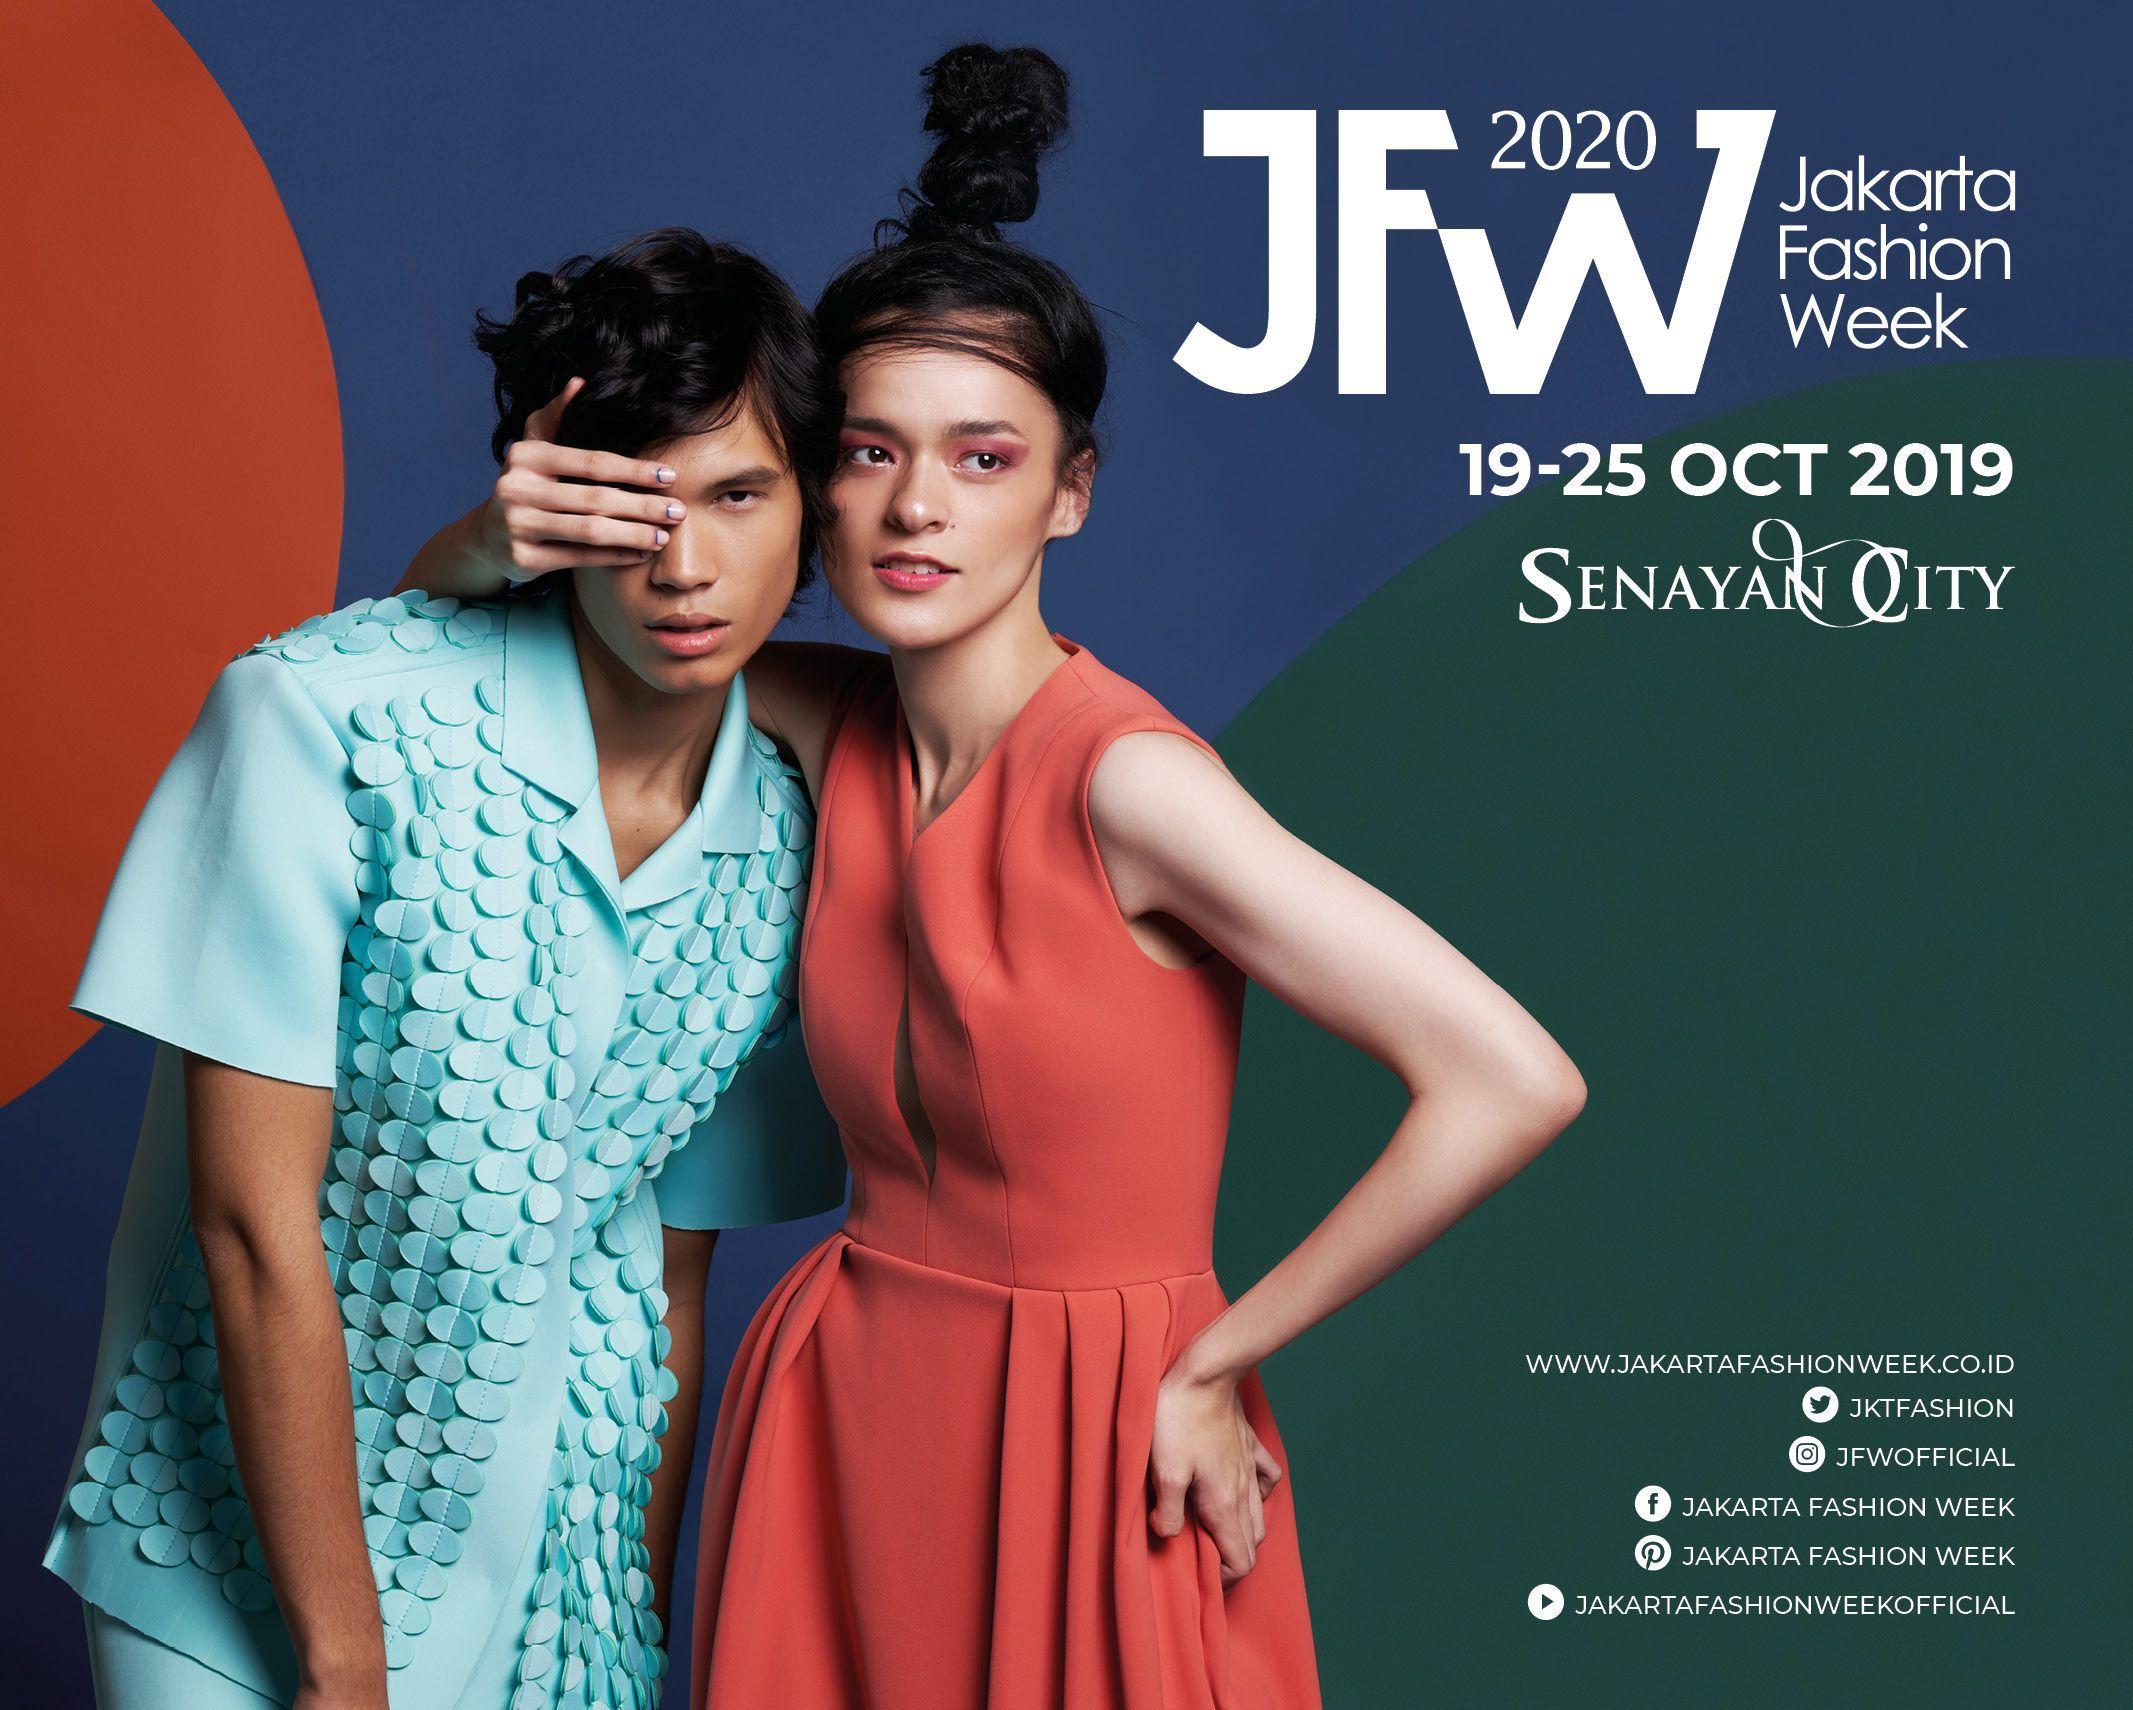 Kejutan Baru di Jakarta Fashion Week 2020, Siap-siap!